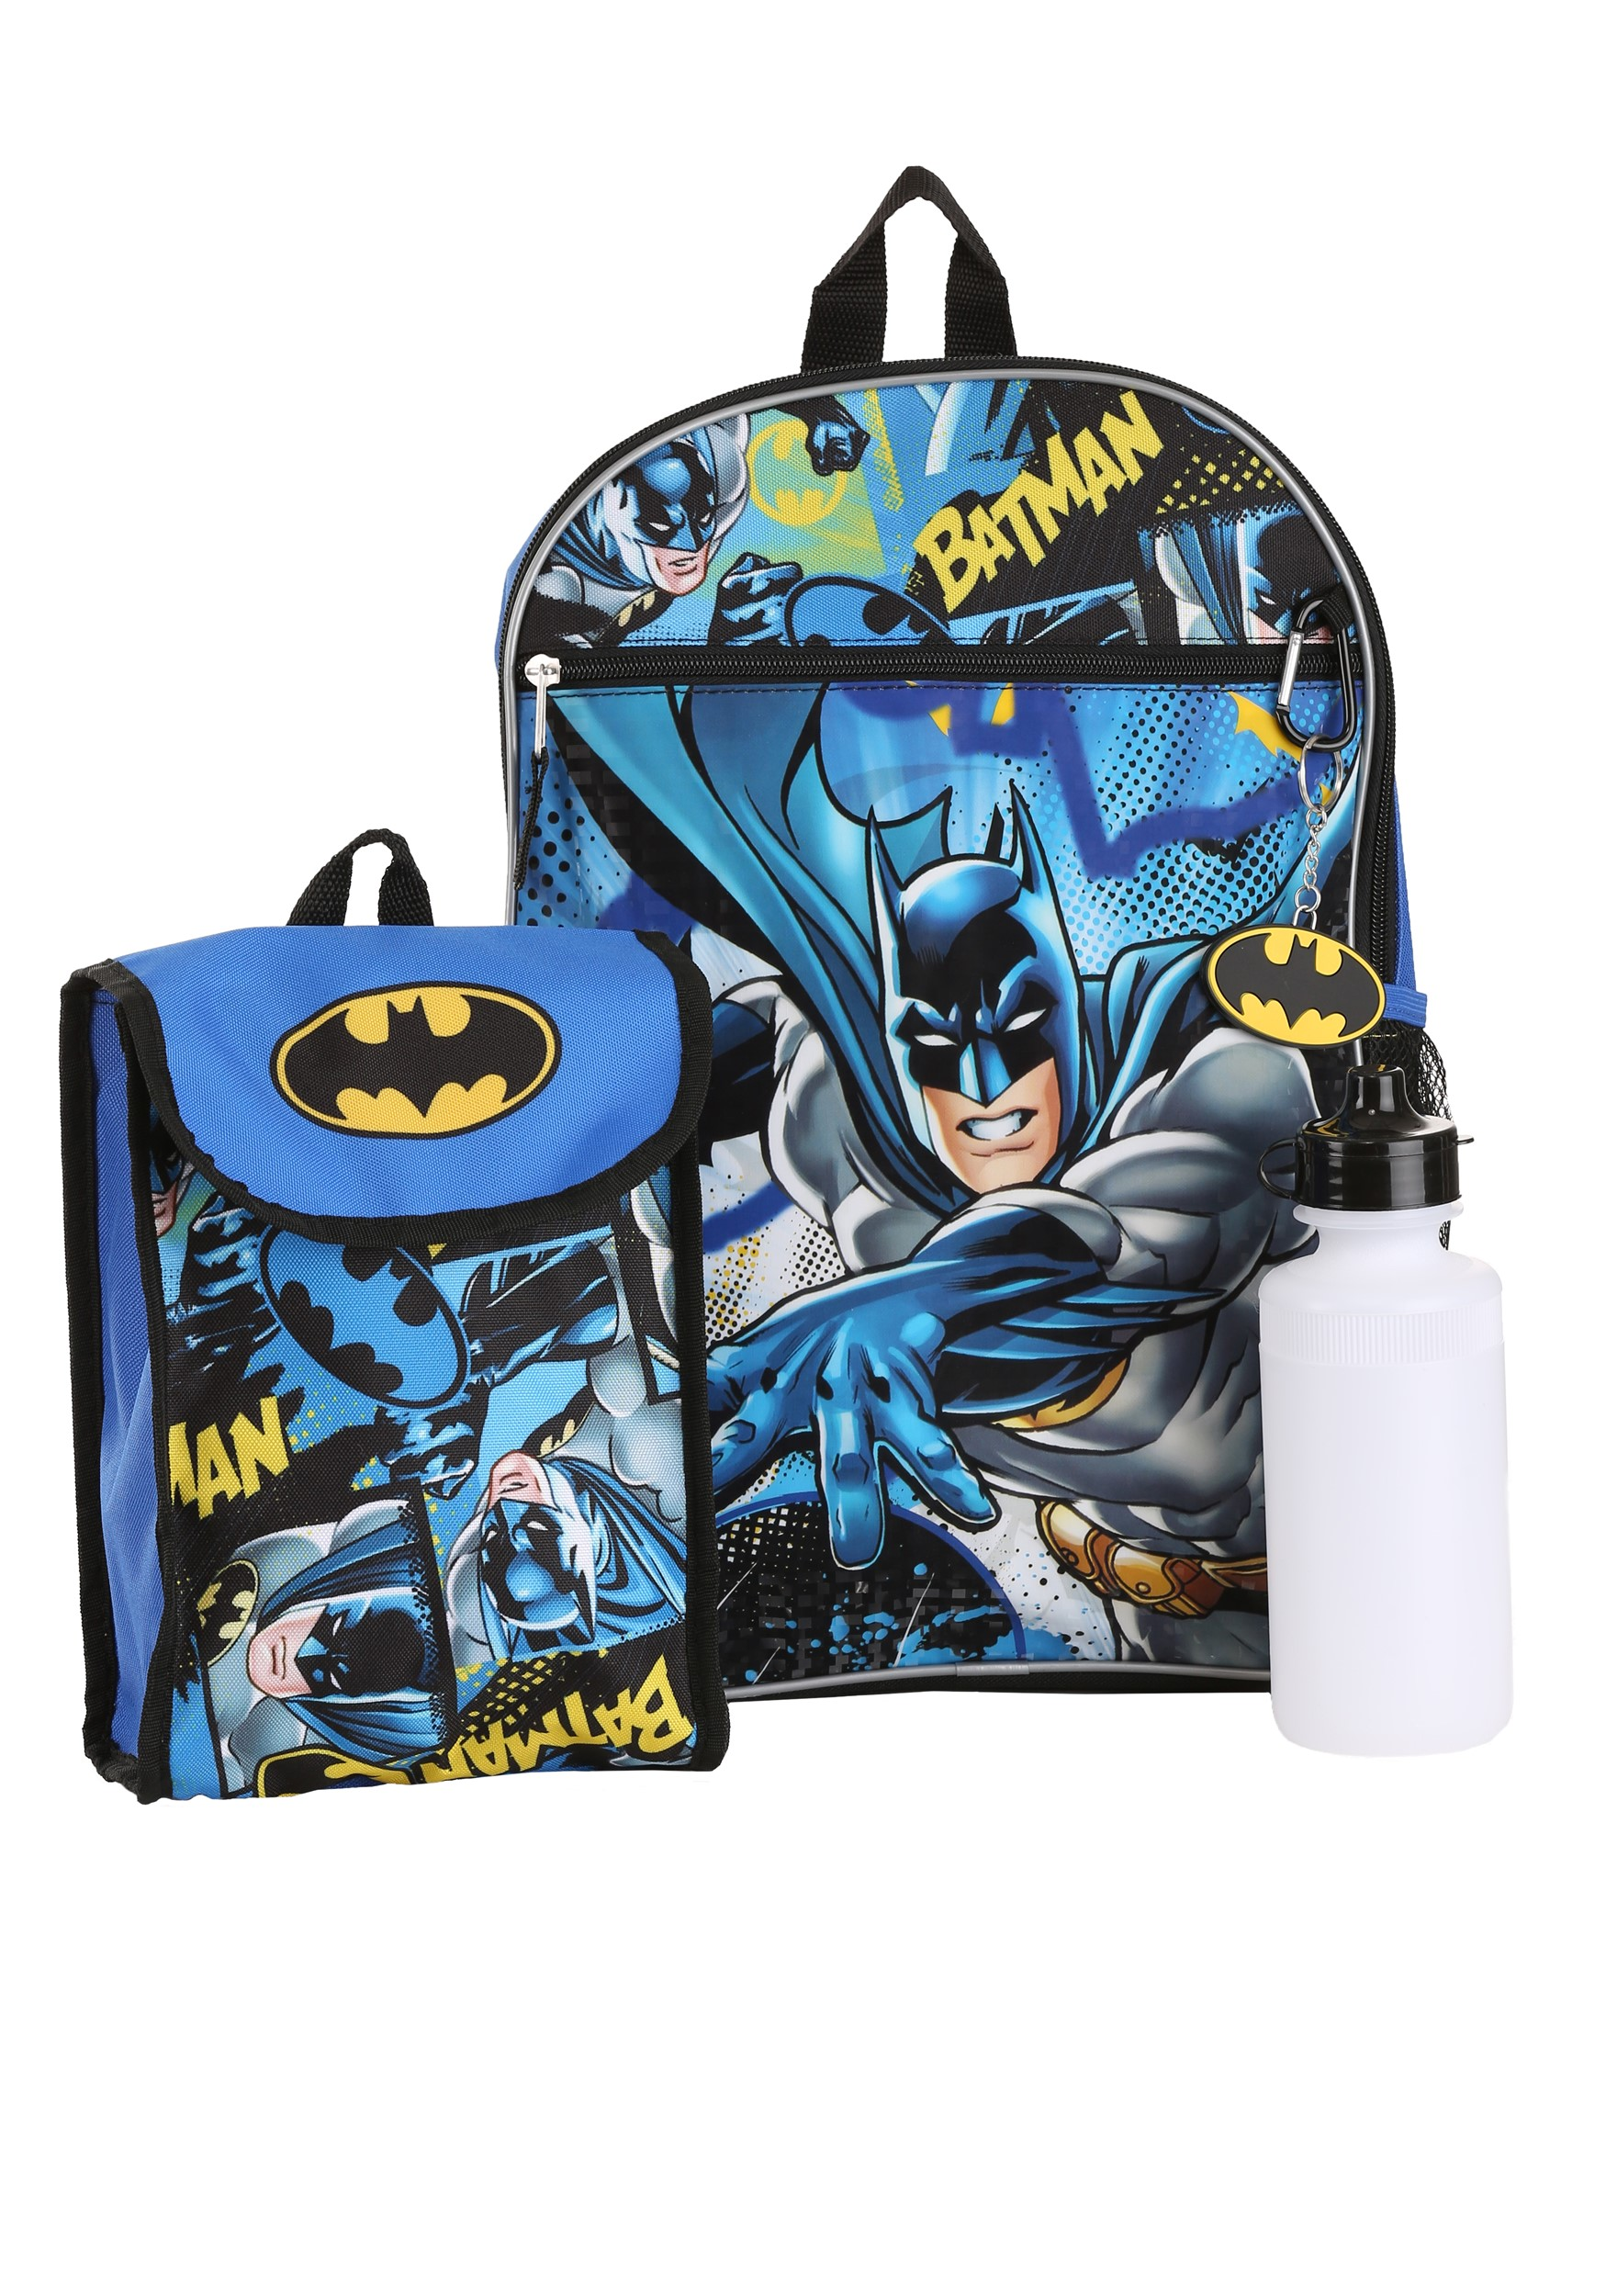 5 pc Batman/Batgirl Backpack Set